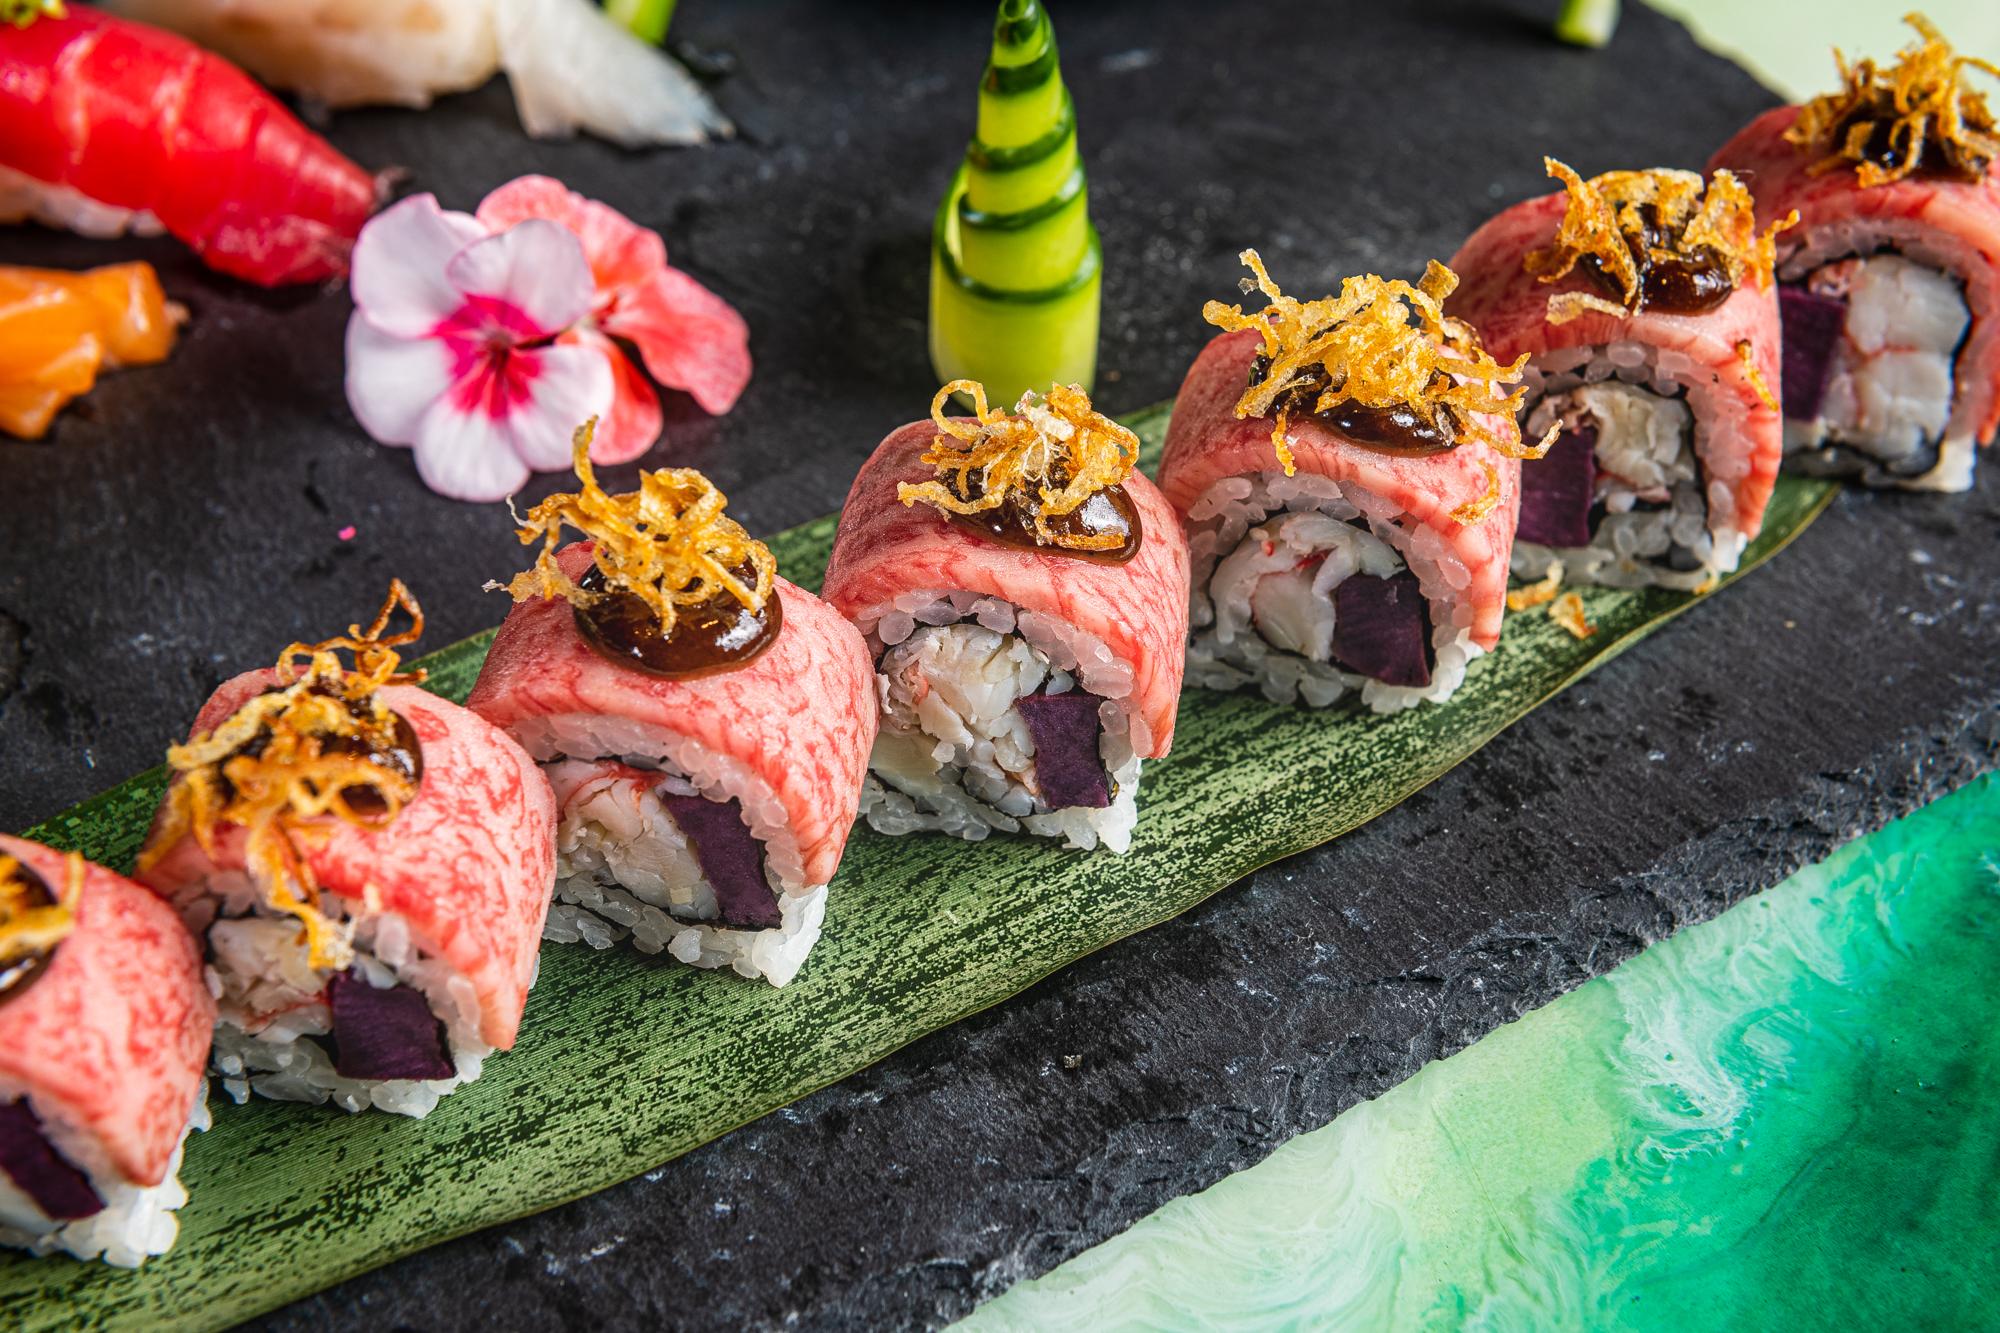 A NaRa-Ya roll with Alaskan king crab, purple sweet potato, and A5 Japanese wagyu beef.